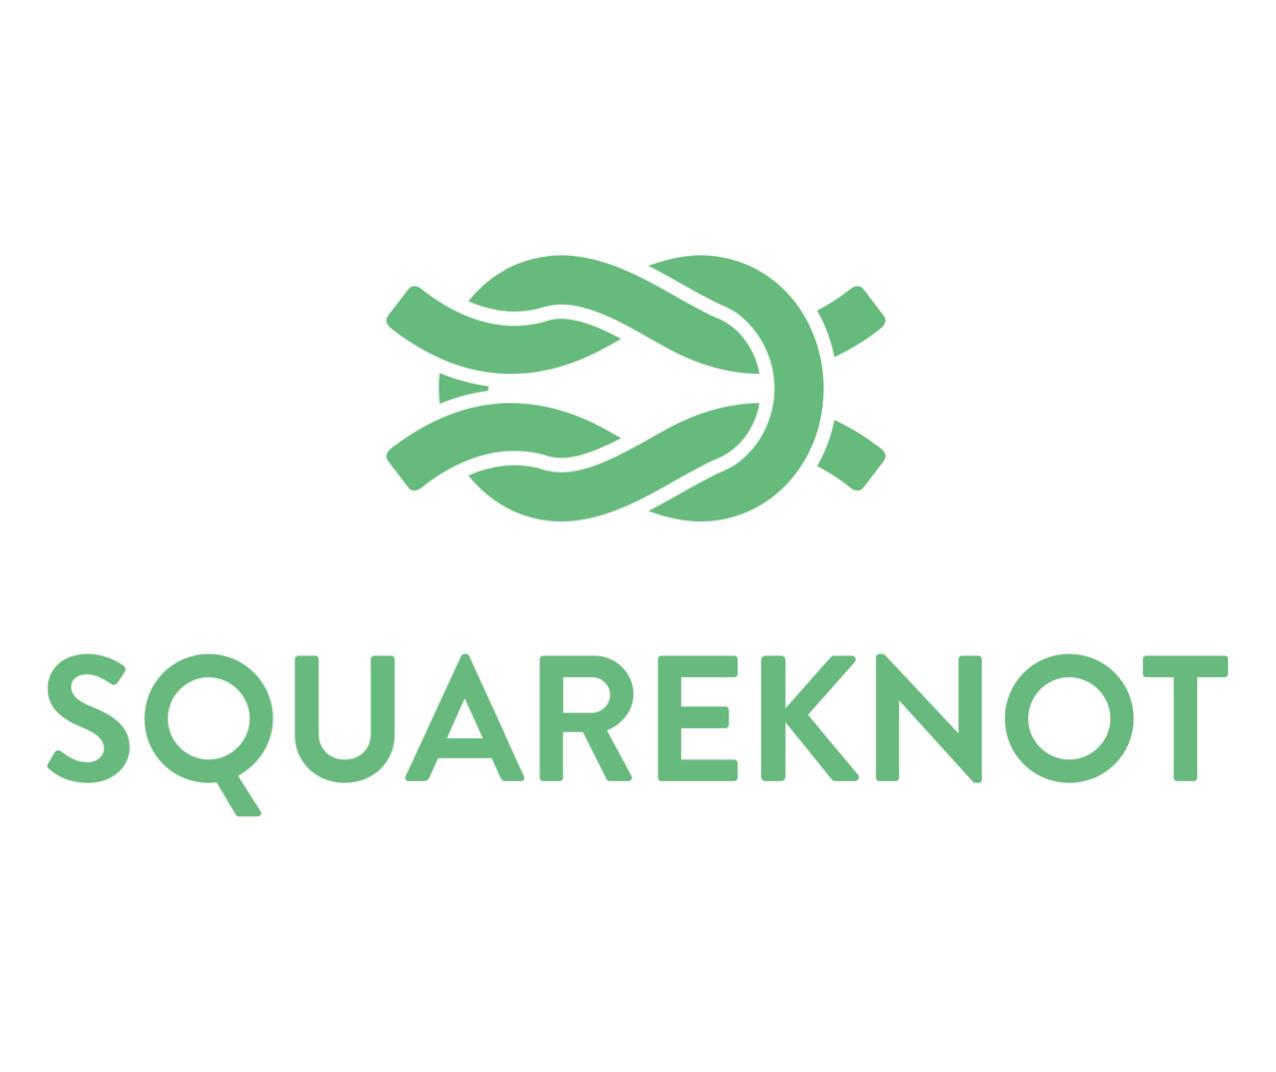 Squareknot 2